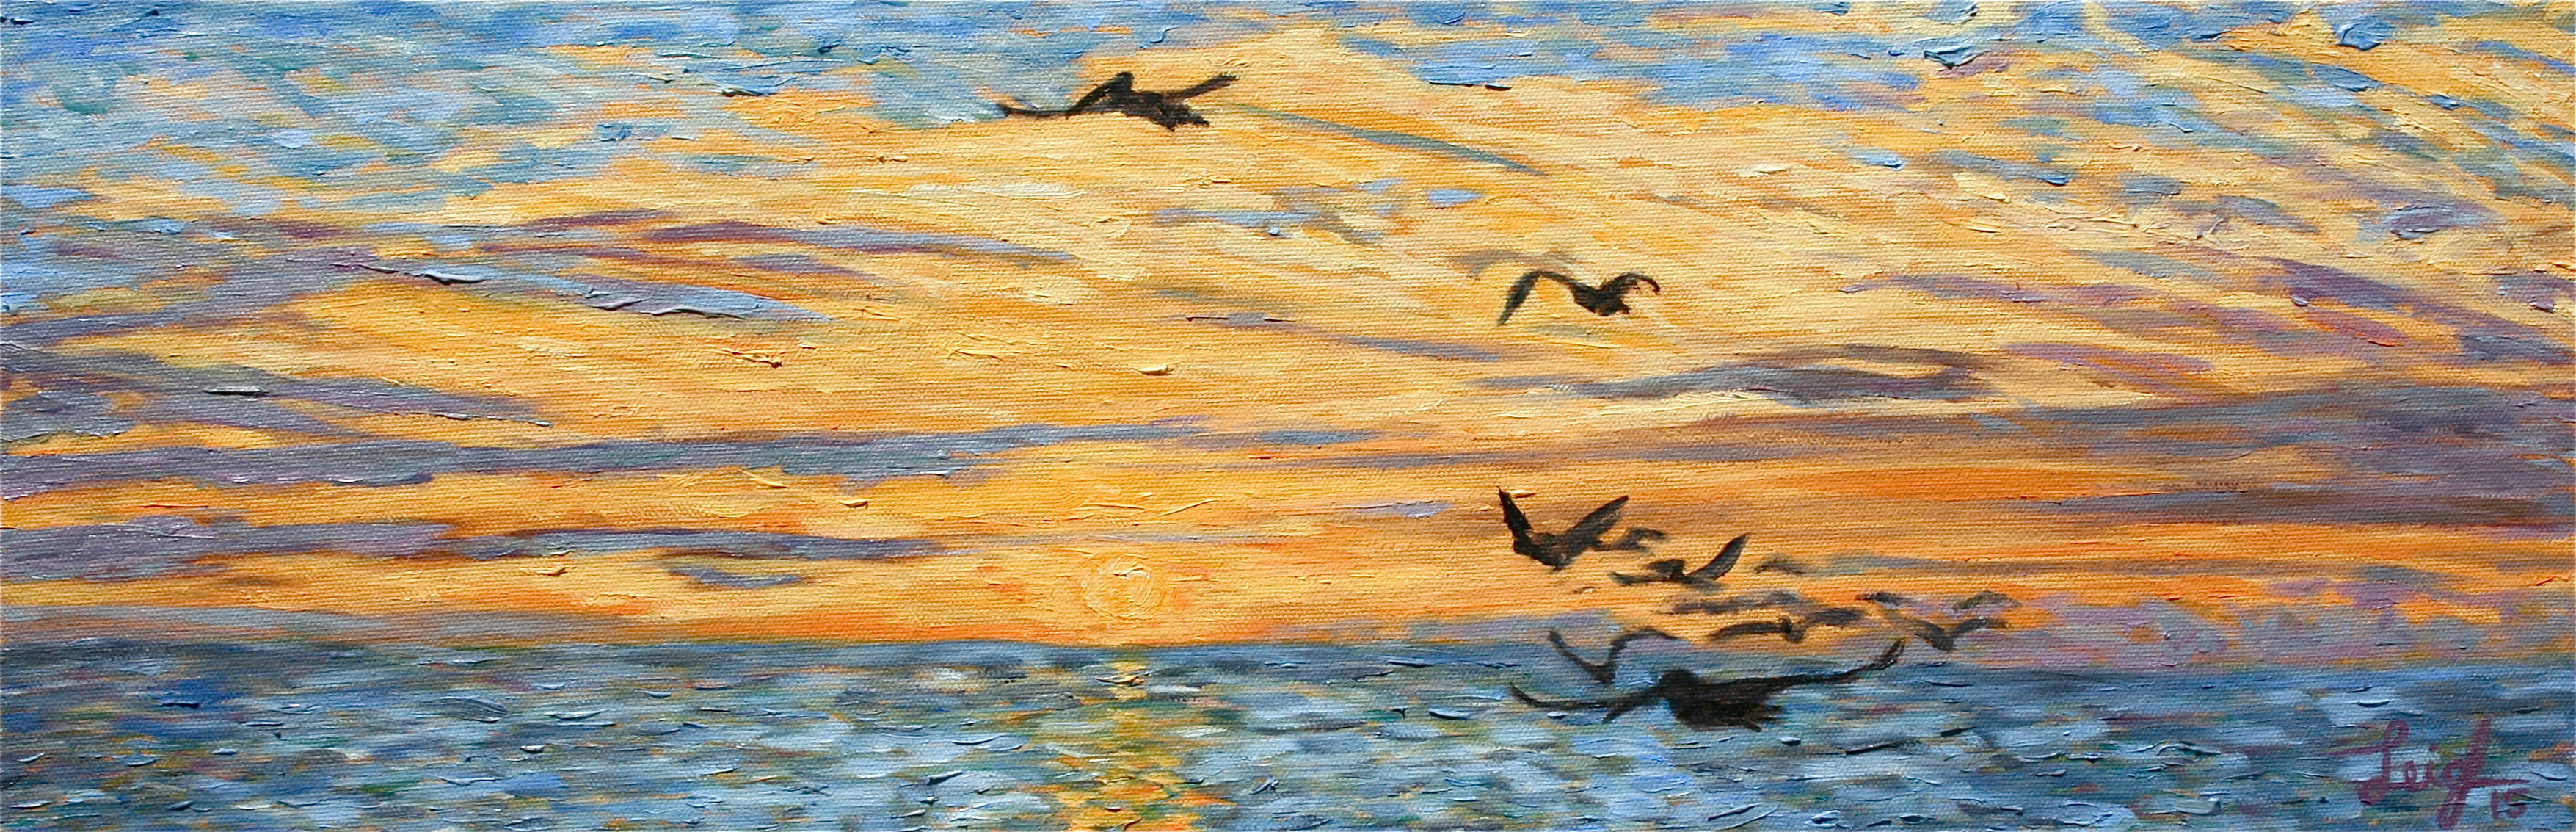 Sunset 2015 #7  ~   Chad Smith & Emily Gray, San Diego, CA  2015 • 24 x 8